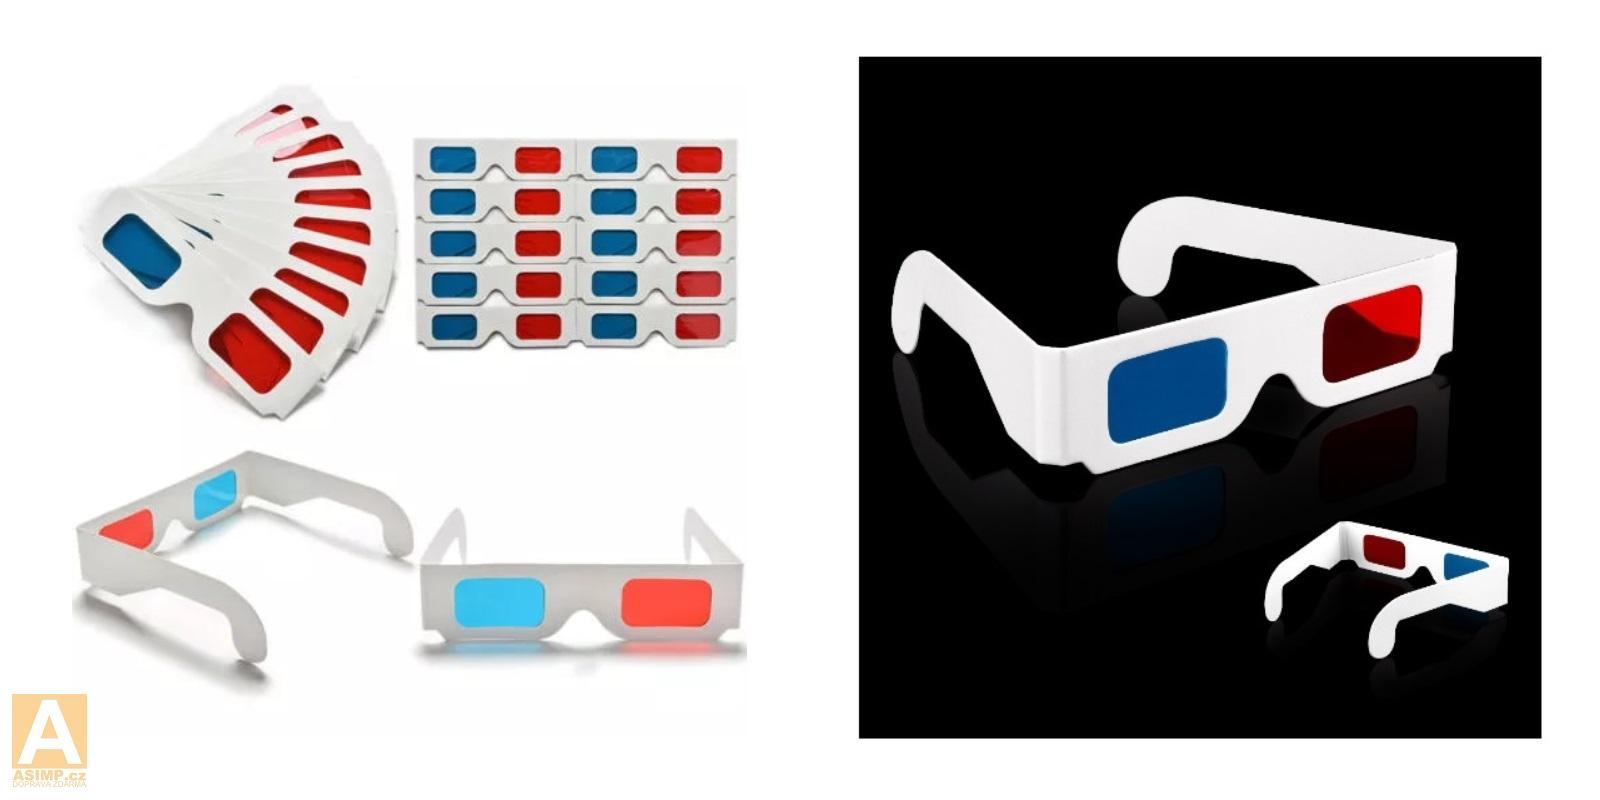 Papírové 3D brýle (10 ks) / A-000487